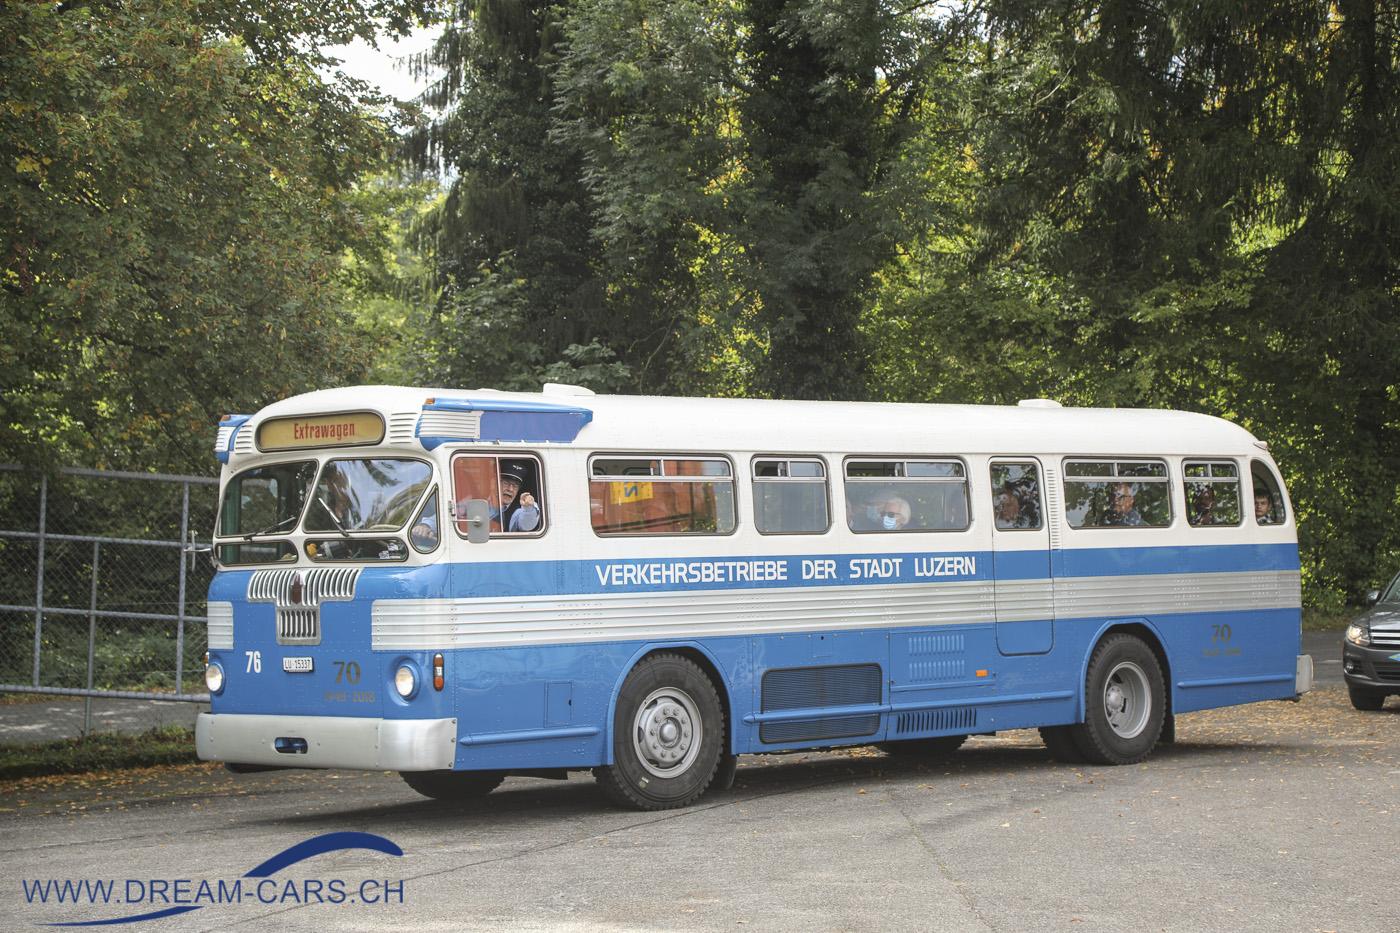 Twin, Coach, vbl-historic, Luzern